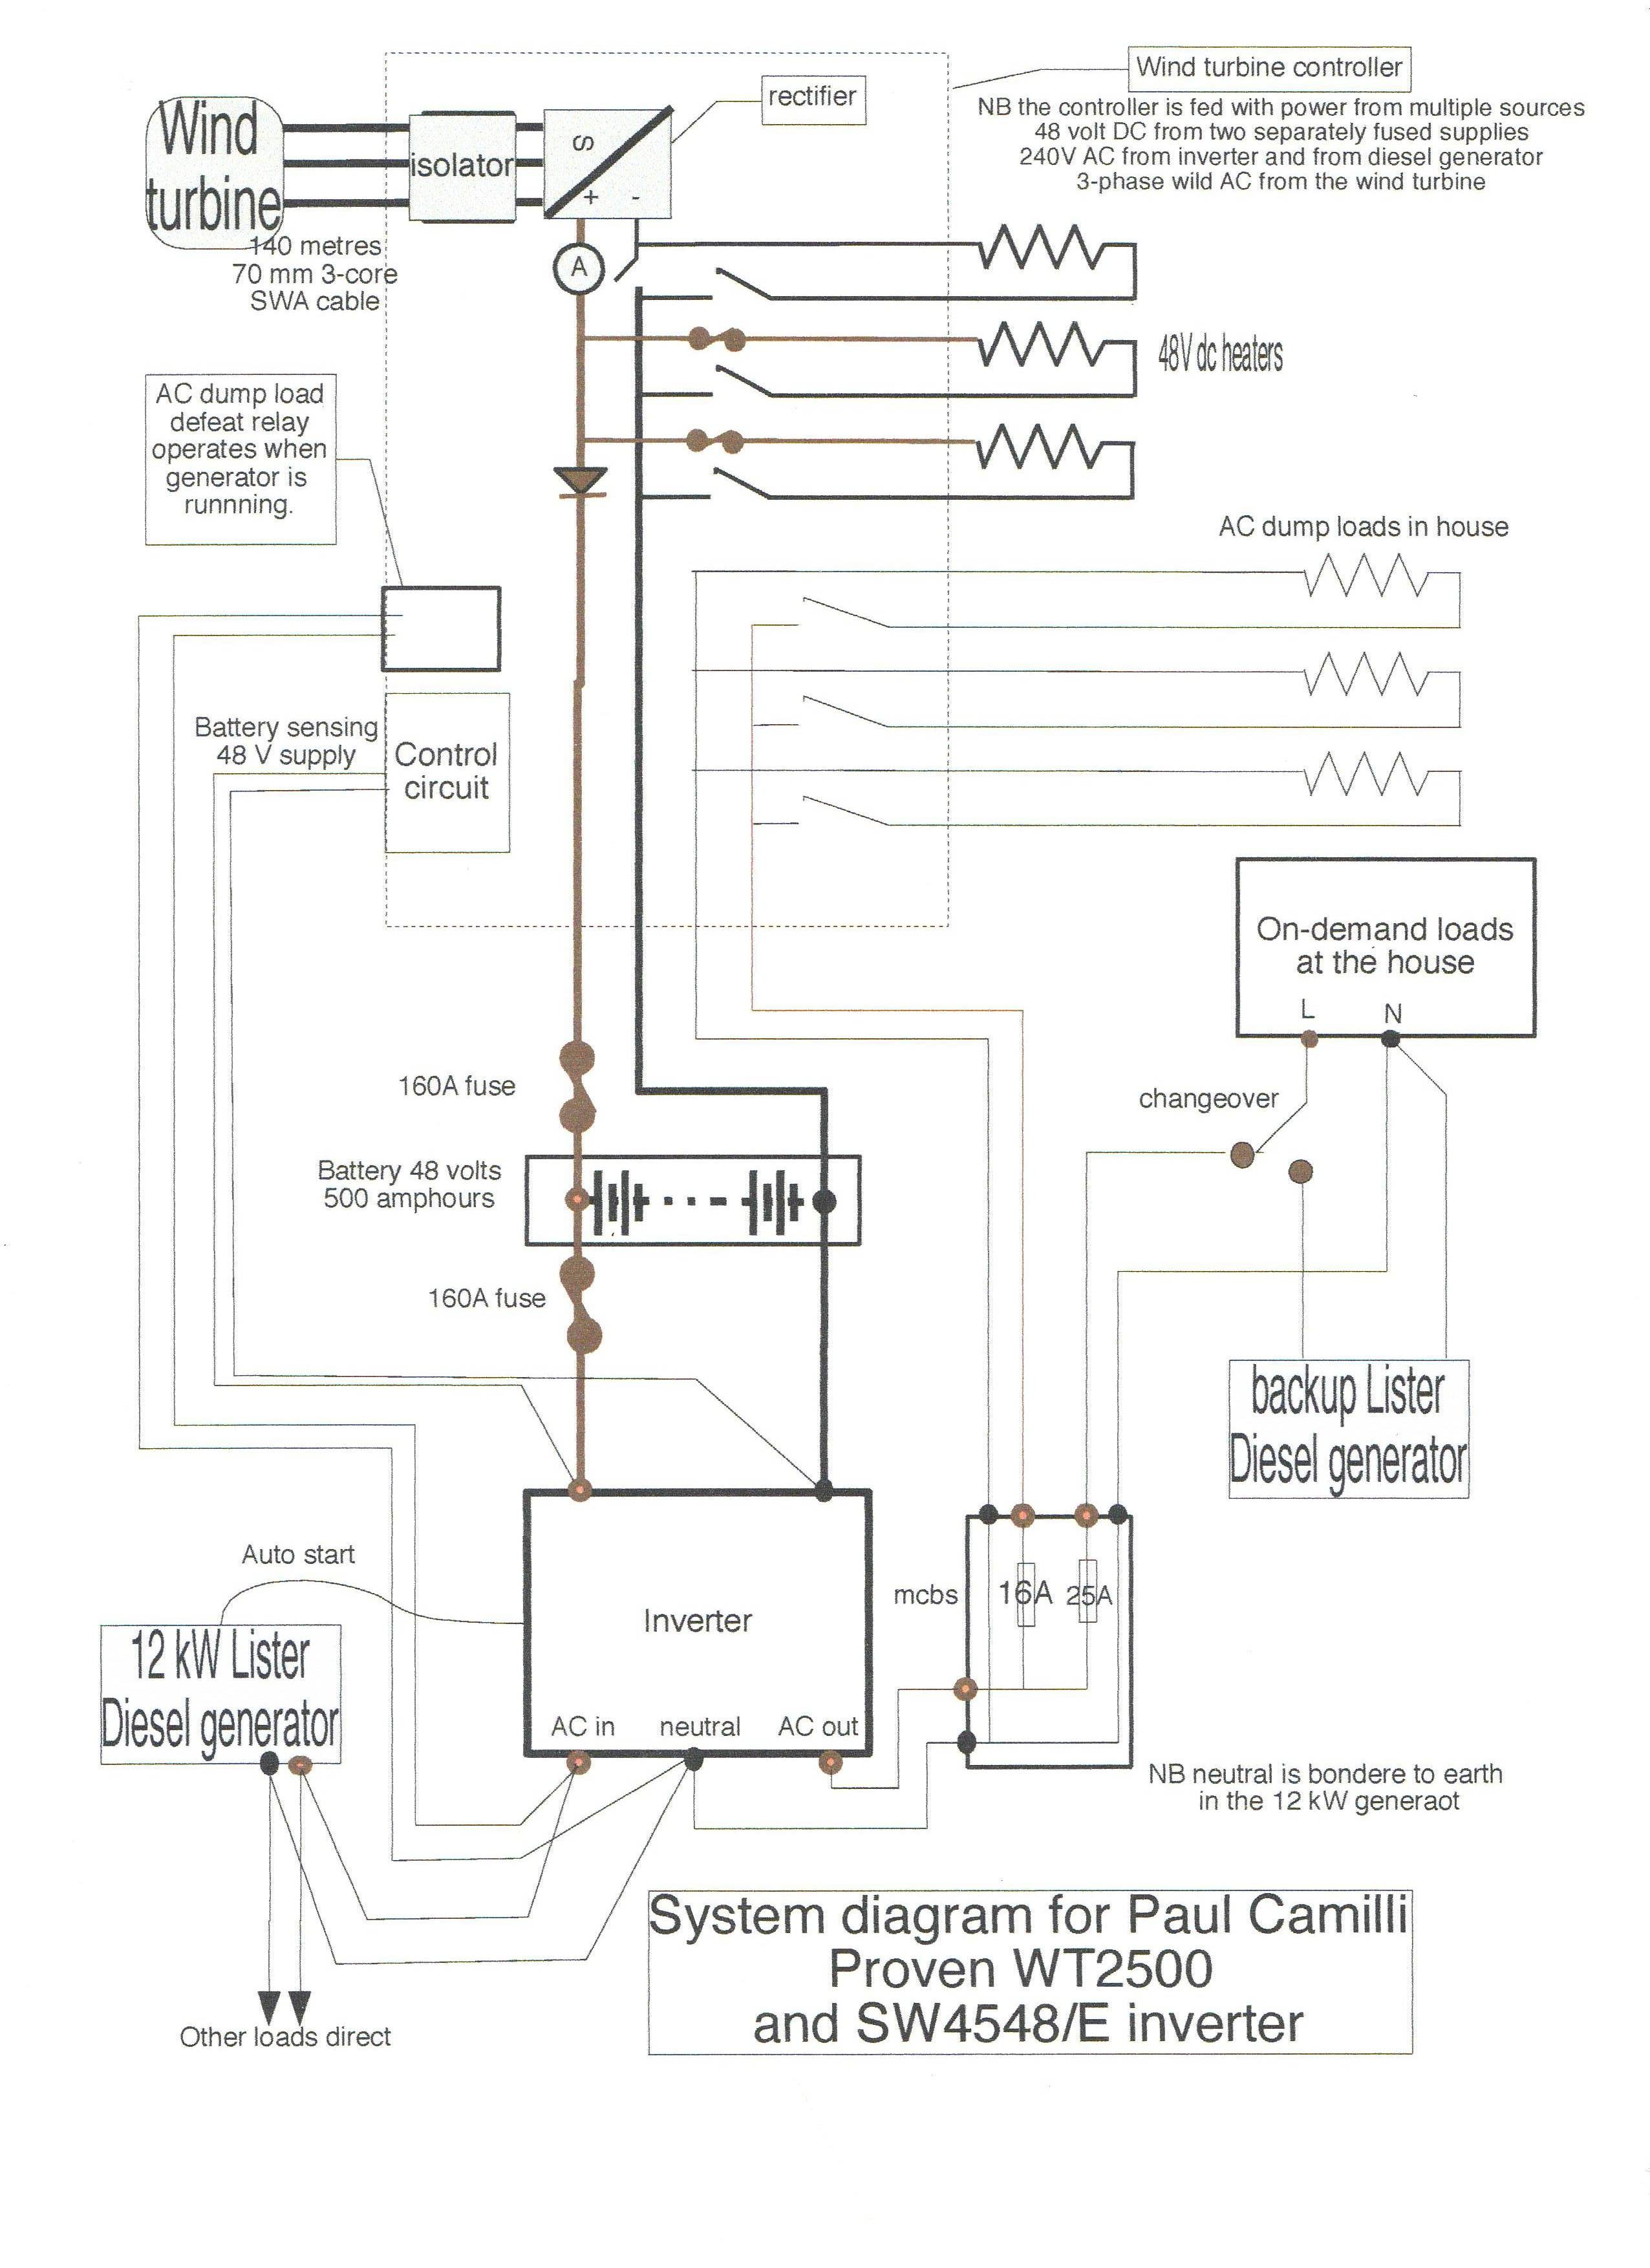 Home Generator Wiring Diagram Ponent Steel Generator Wiring Diagram Wind Turbine Wiring Of Home Generator Wiring Diagram